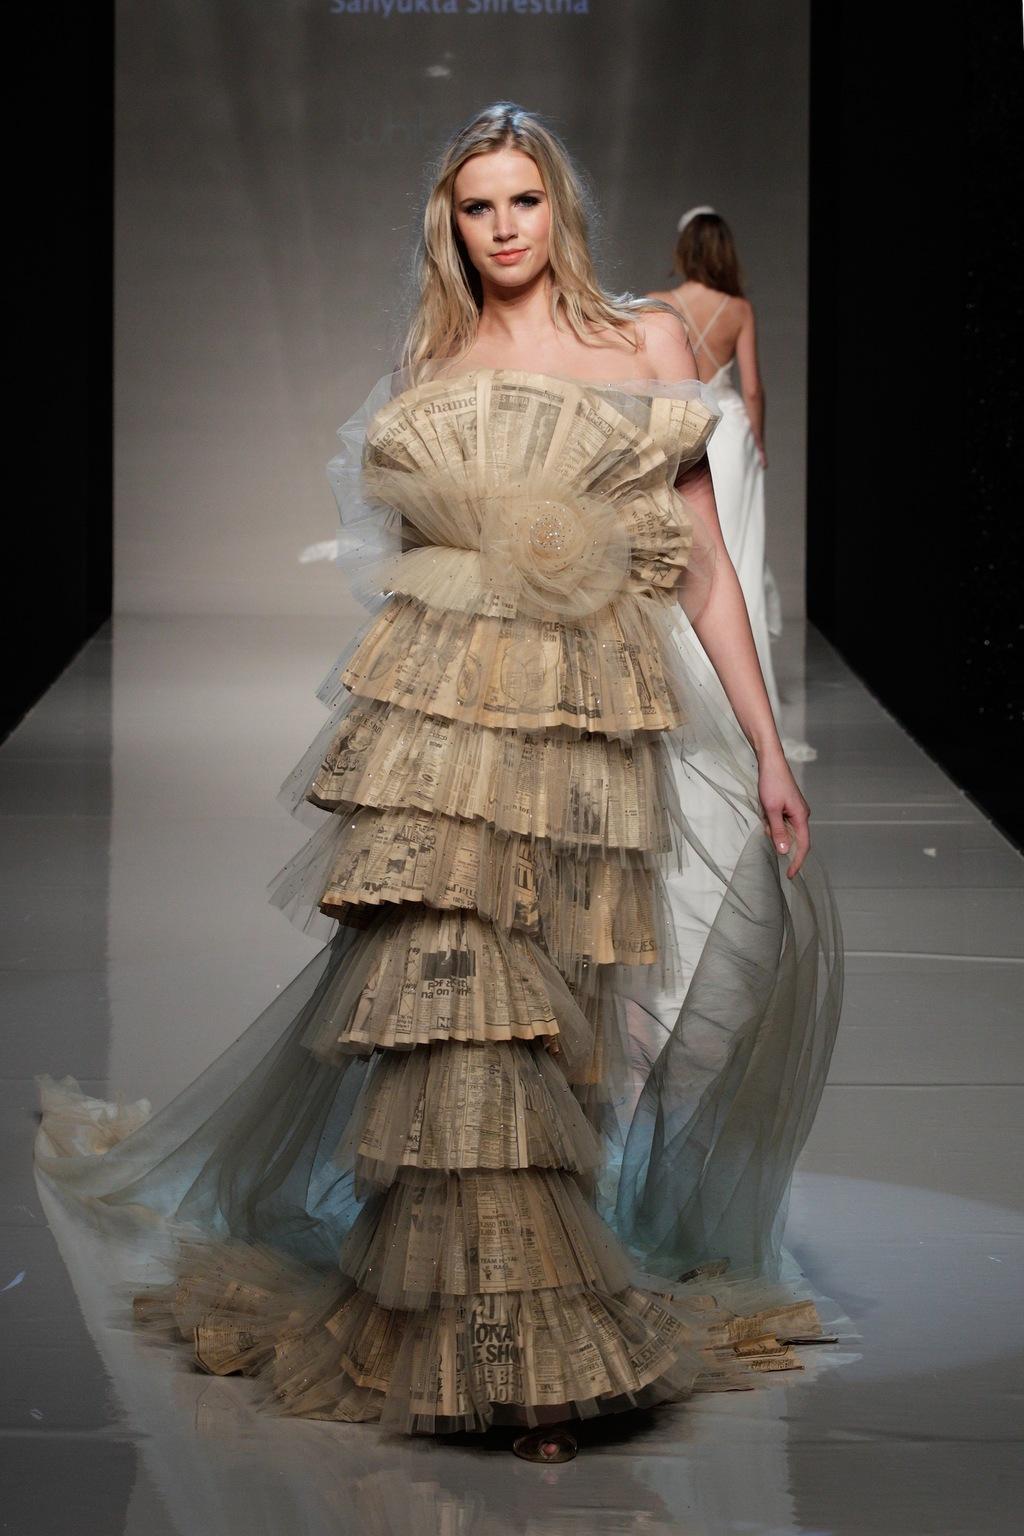 London-2013-wedding-dress-international-bridal-gowns-sanjuka-newspaper-wedding-dress.full